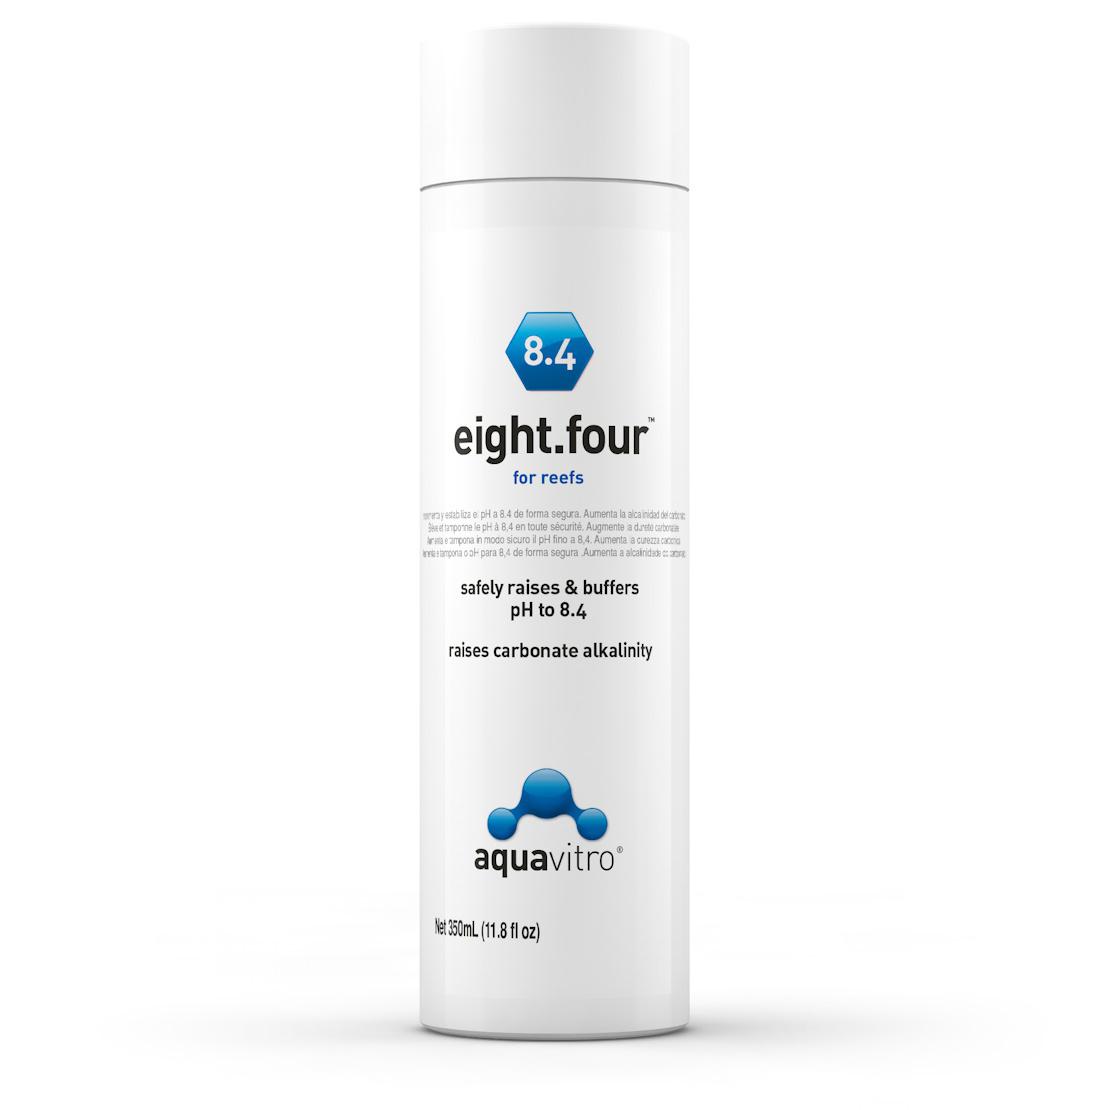 Seachem Aquavitro 150 ml Eightfour